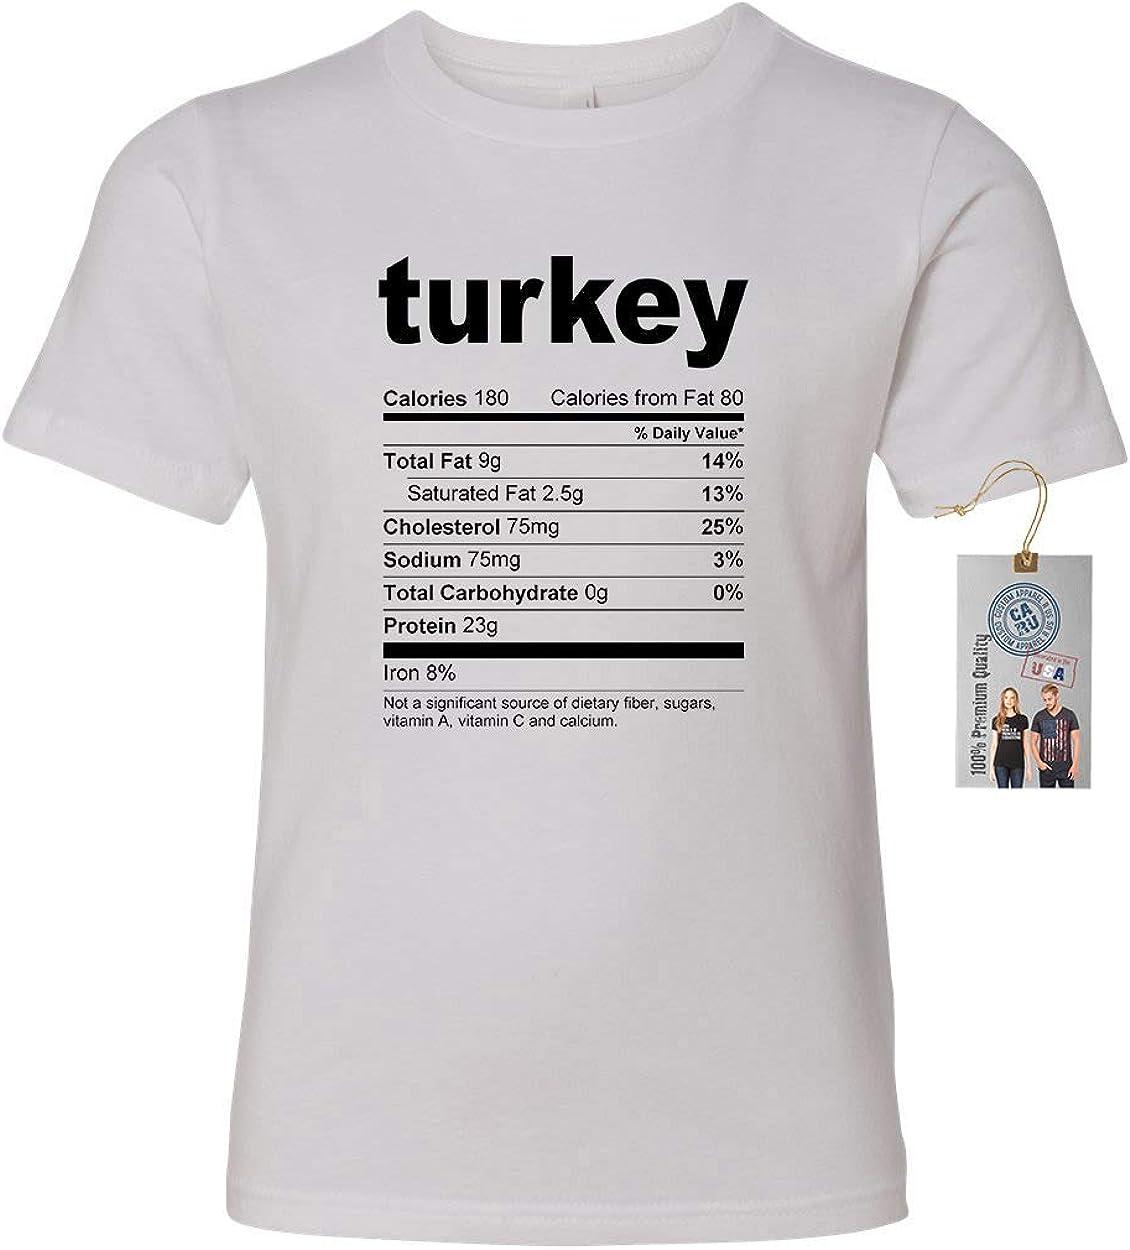 Custom Apparel R Us Turkey Nutrional Facts Girls Boys Short Sleeve